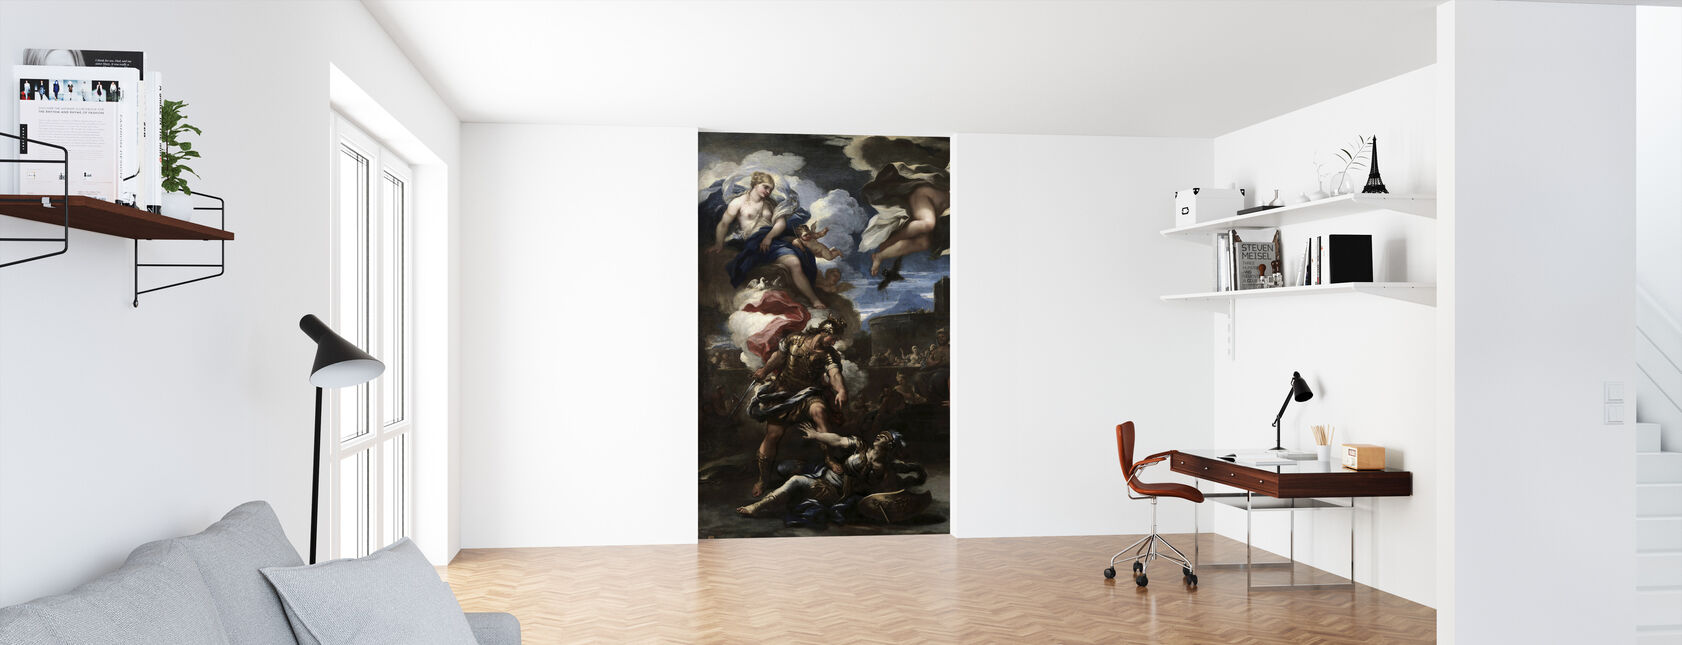 Aeneas defeats Turnus - Luca Giordano - Wallpaper - Office